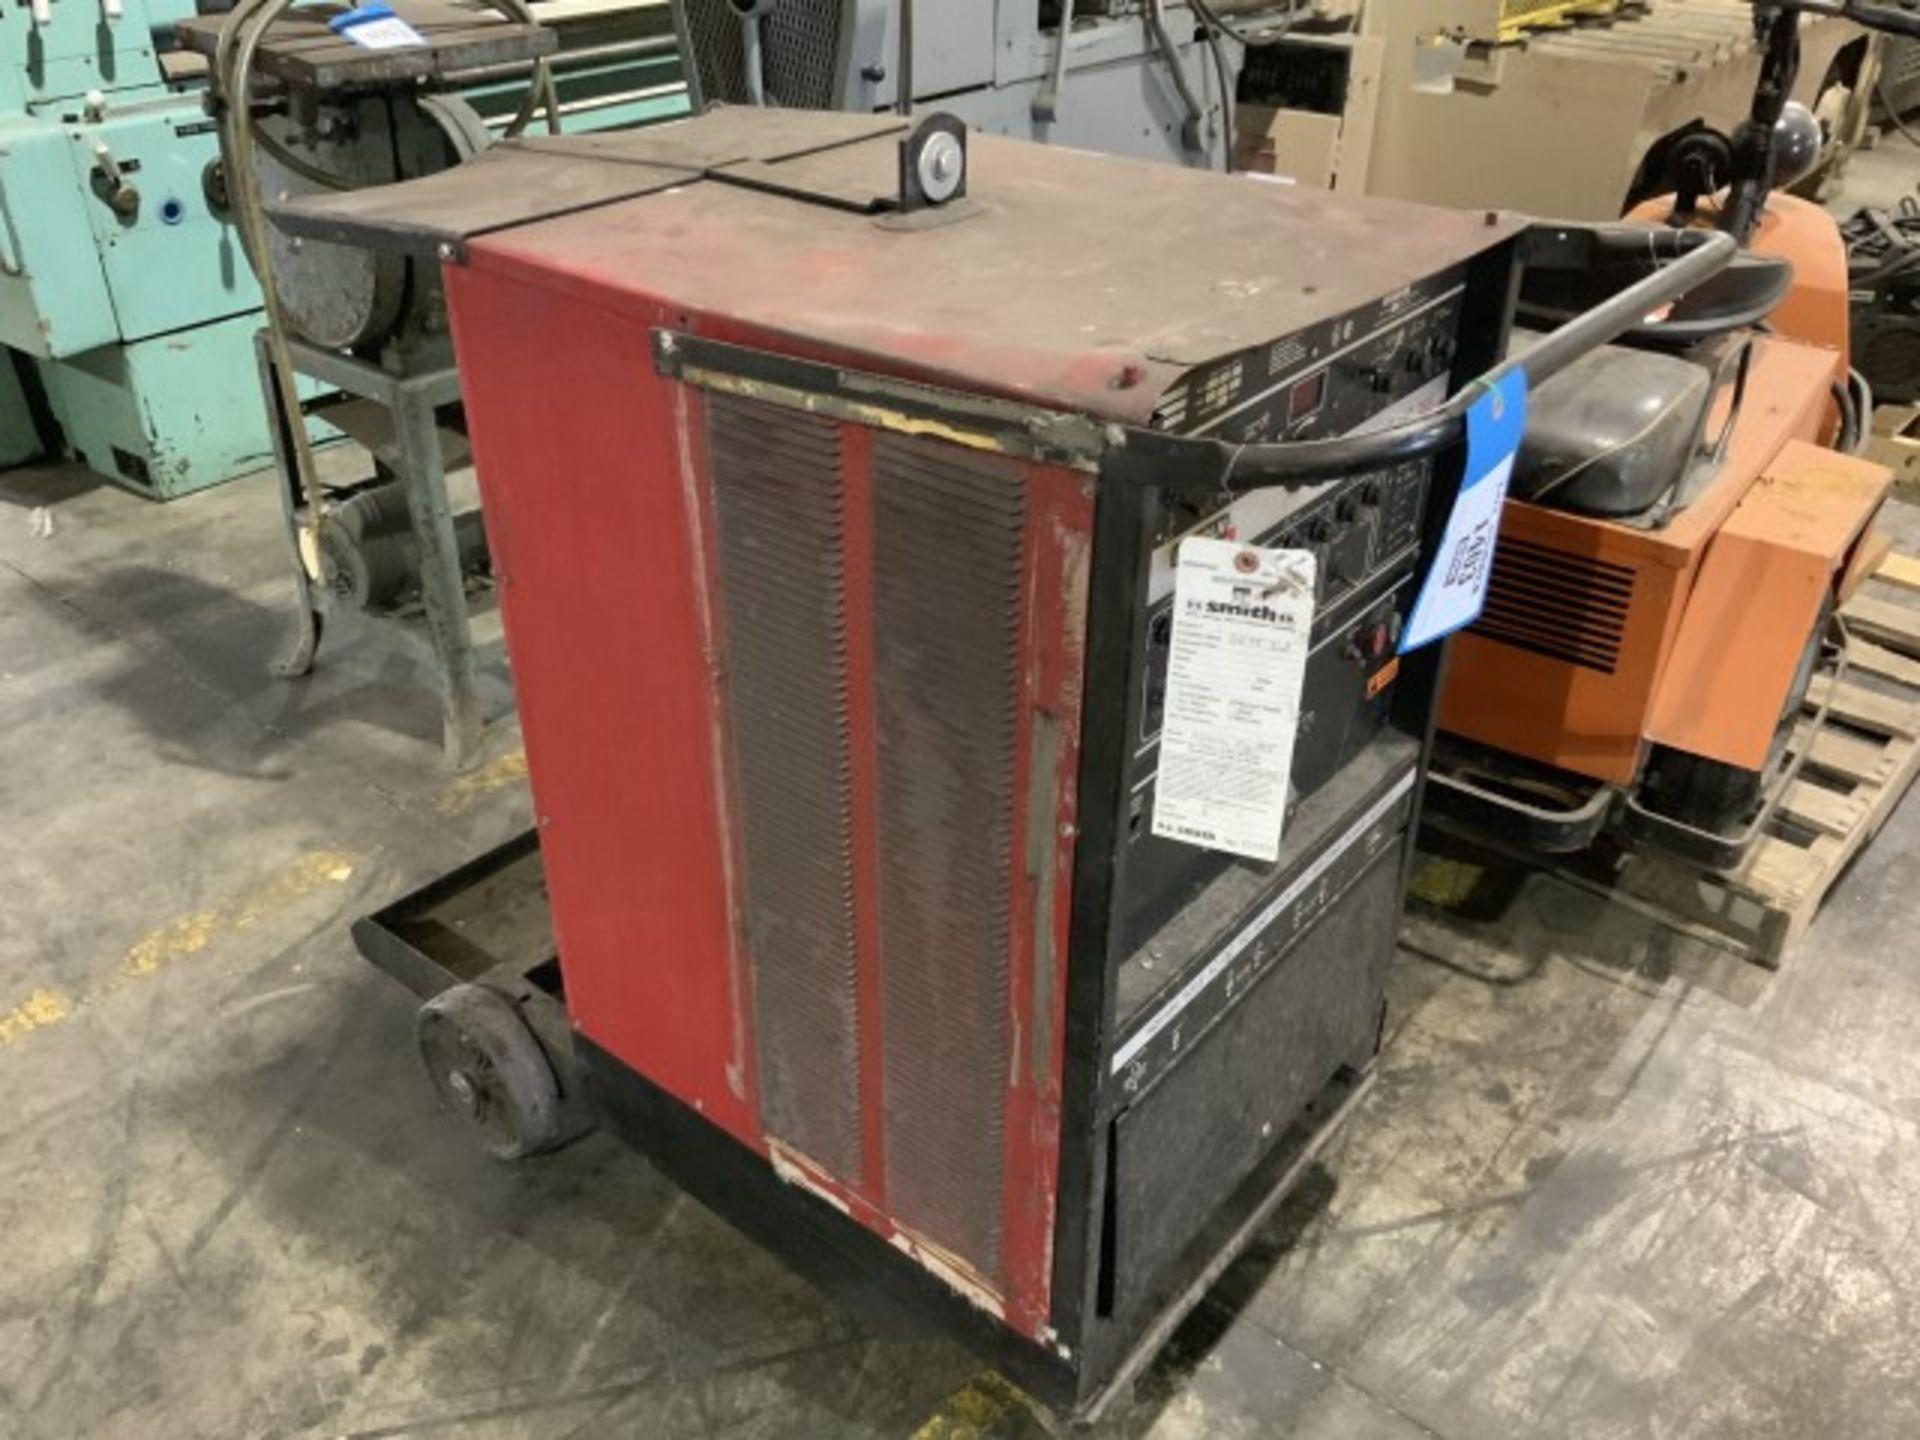 Welding power supply - Image 2 of 3